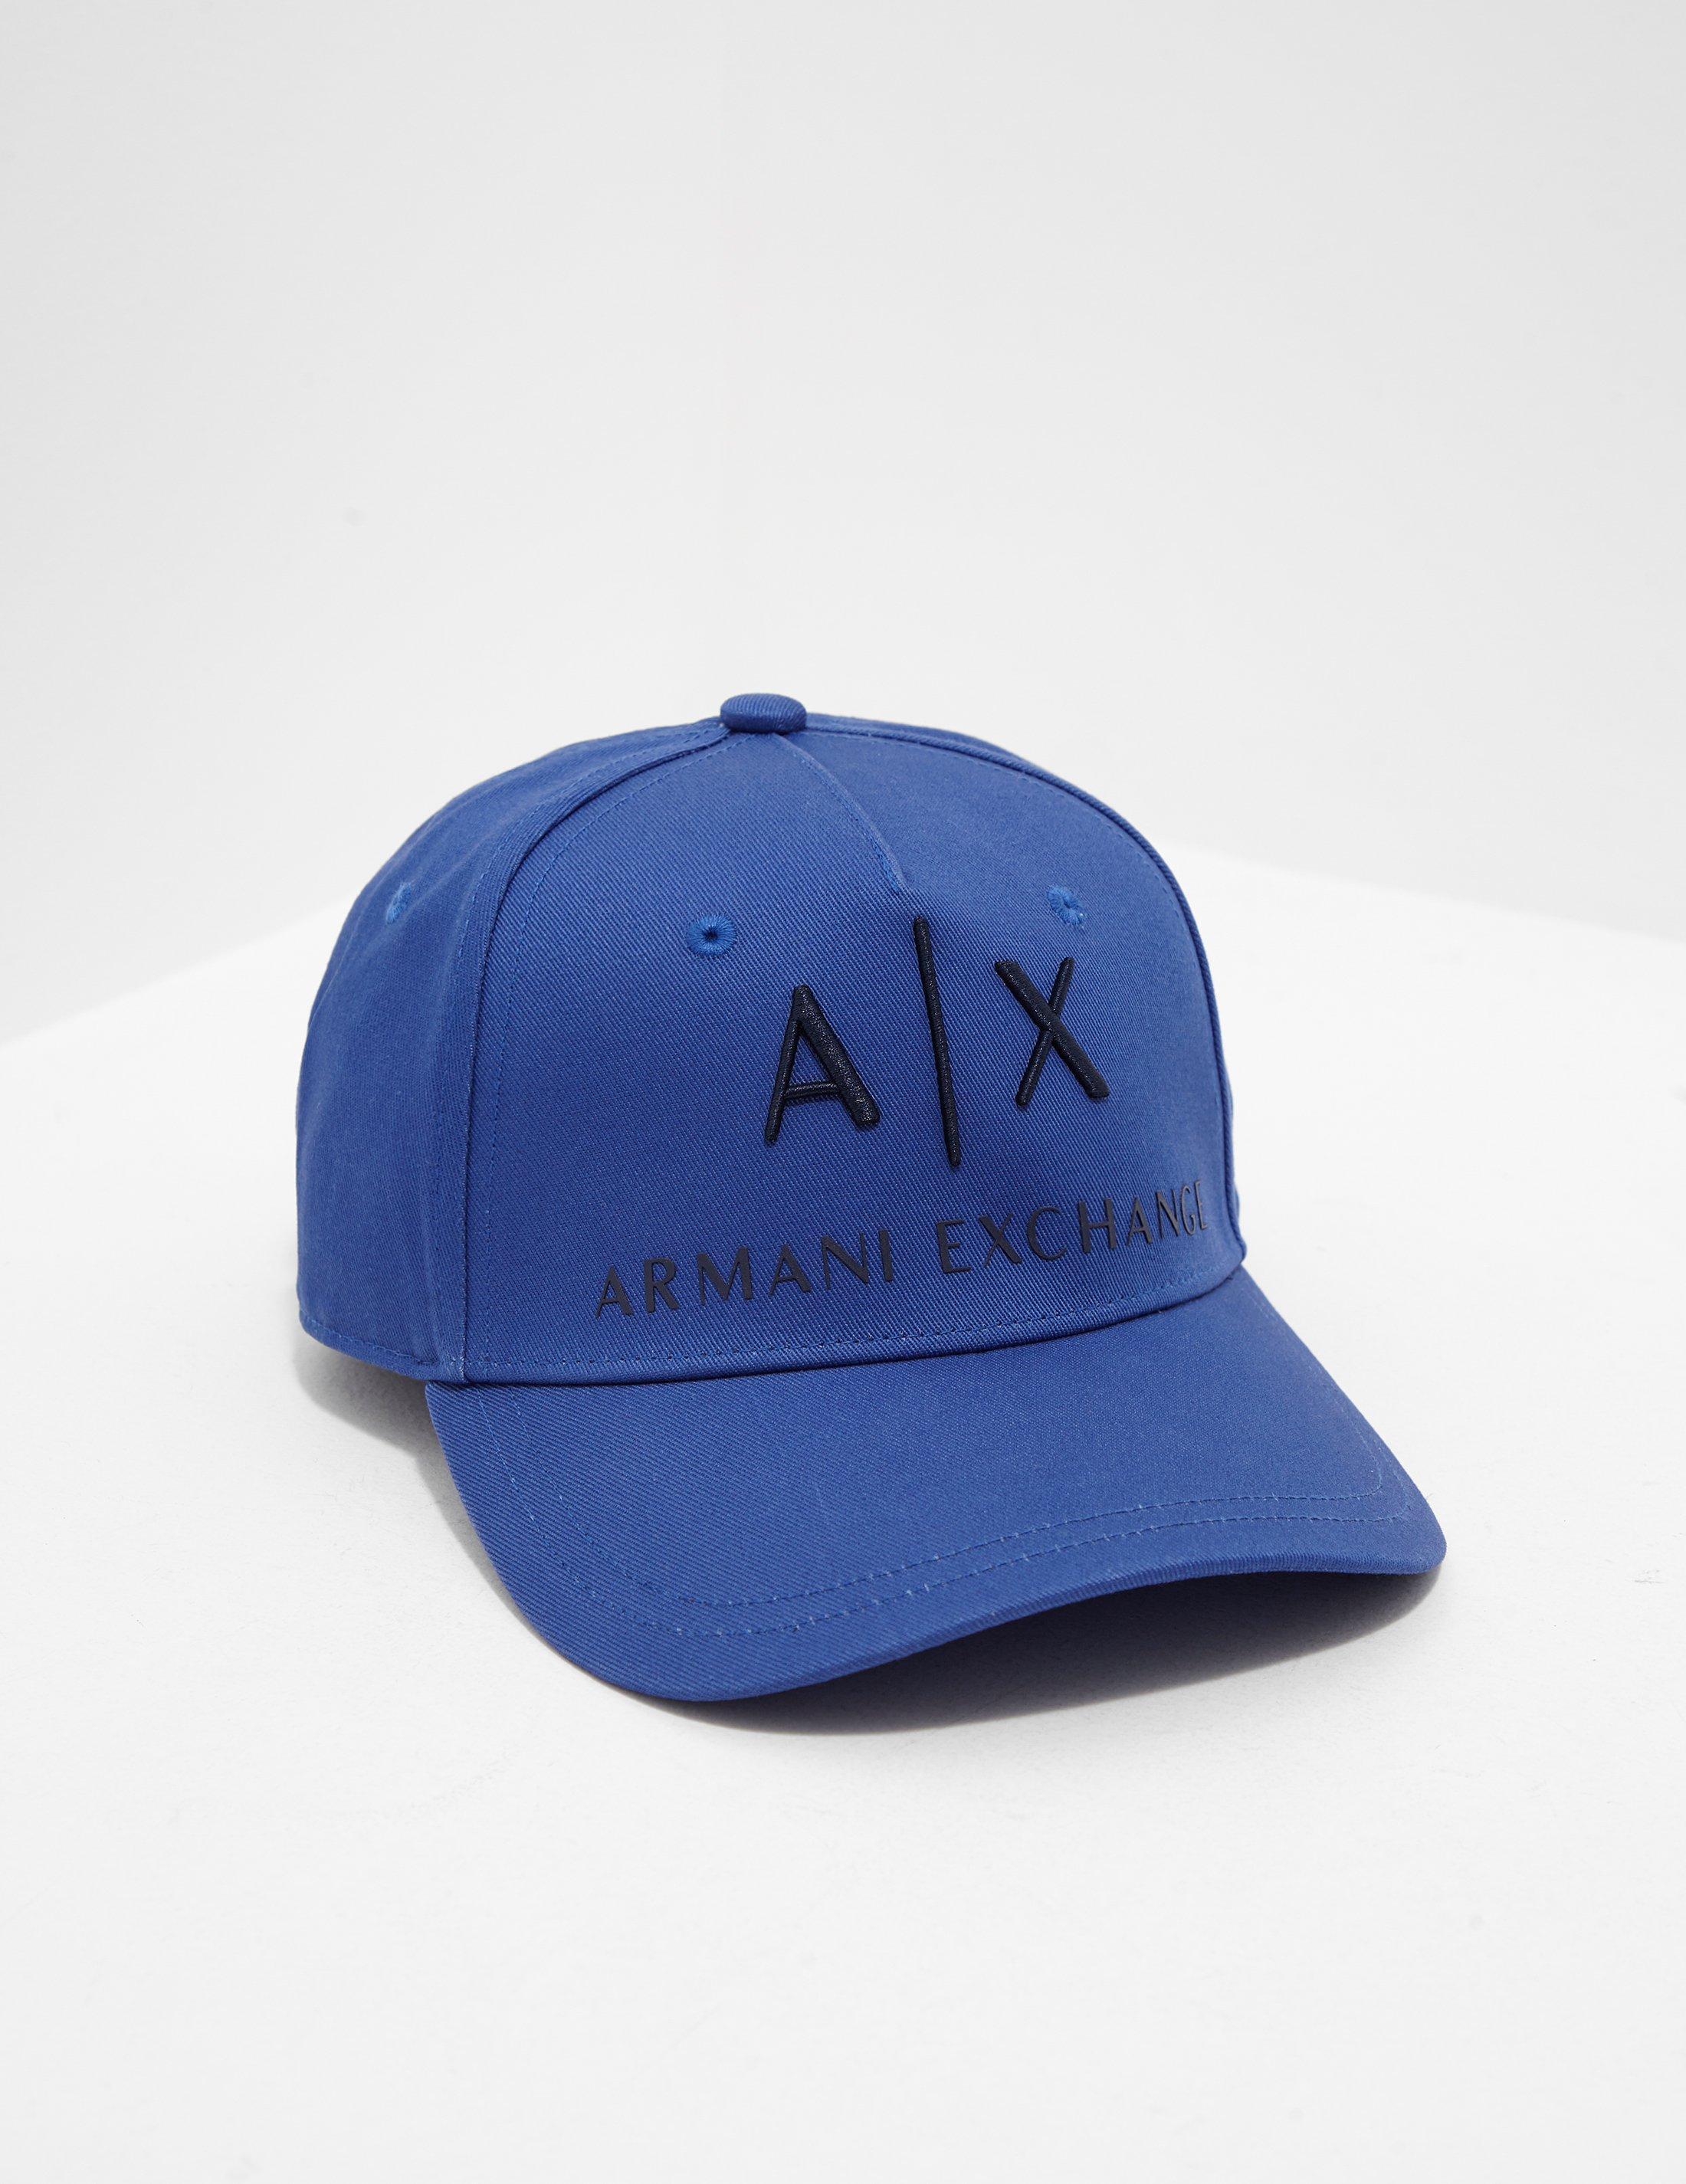 8435b250 Lyst - Armani Exchange Cotton Logo Cap Blue in Blue for Men - Save 56%